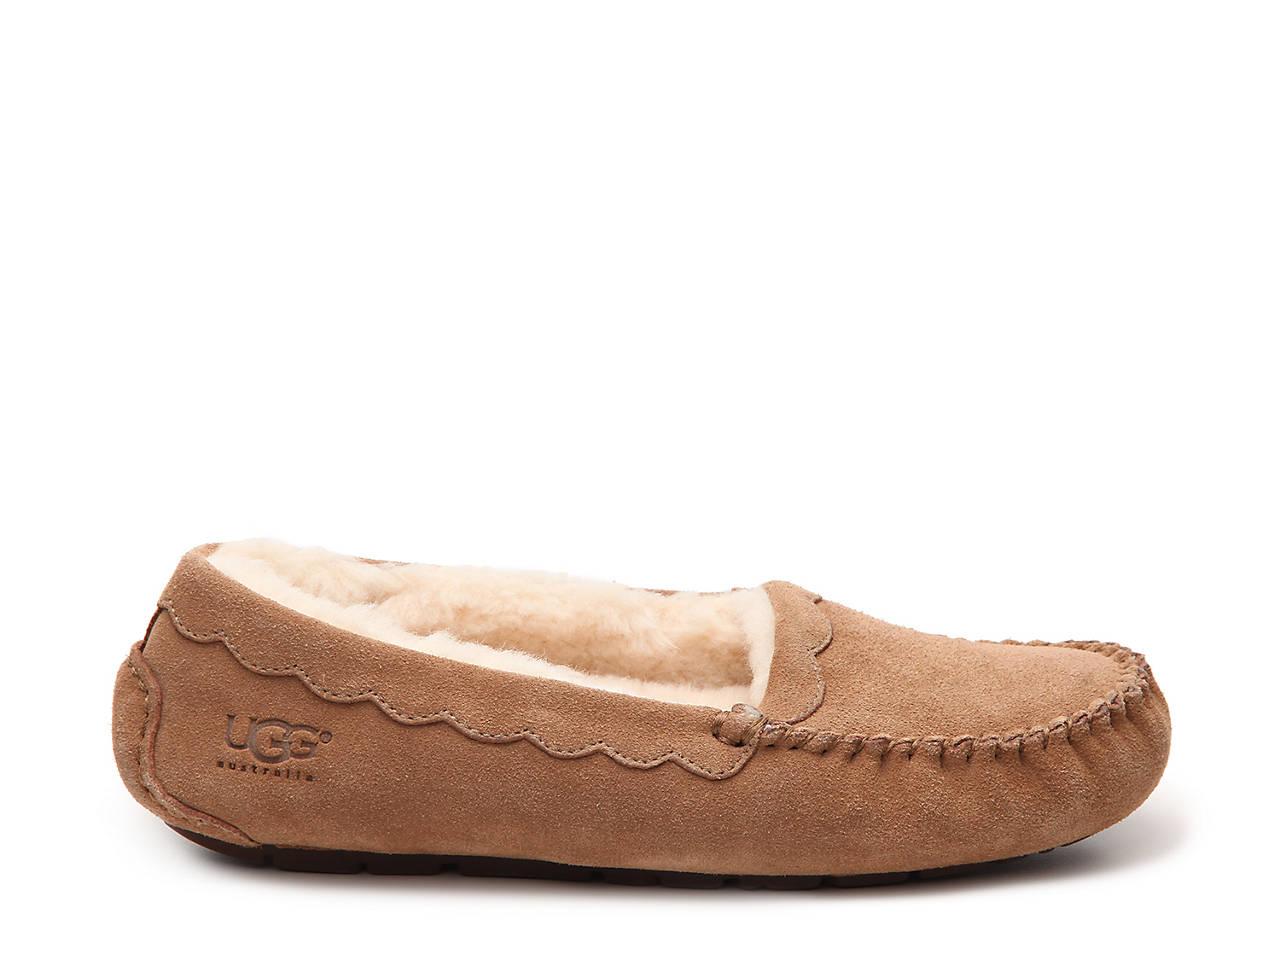 a6caa257c529 UGG Australia Scallop Suede Slipper Women s Shoes